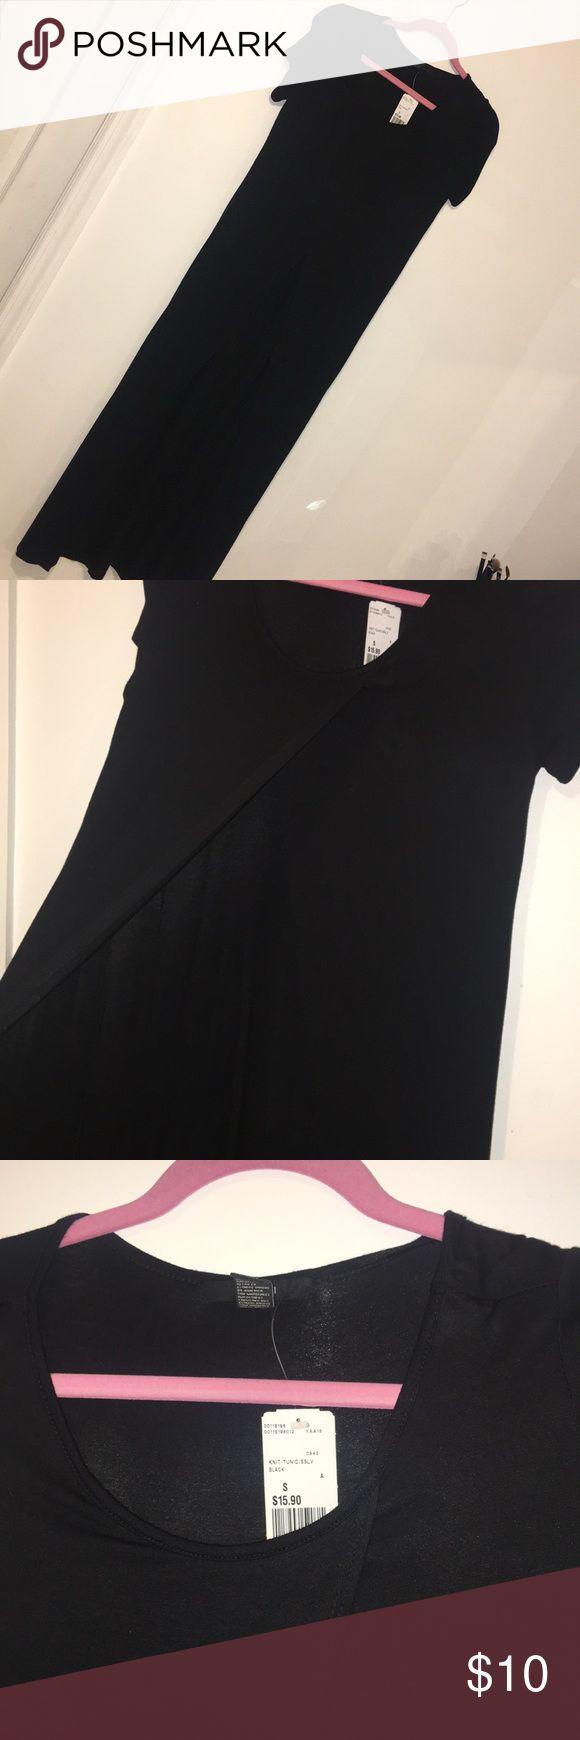 Long black tunic NWT Long black tunic. Shirt that drapes all the way down to the floor Tops Tunics